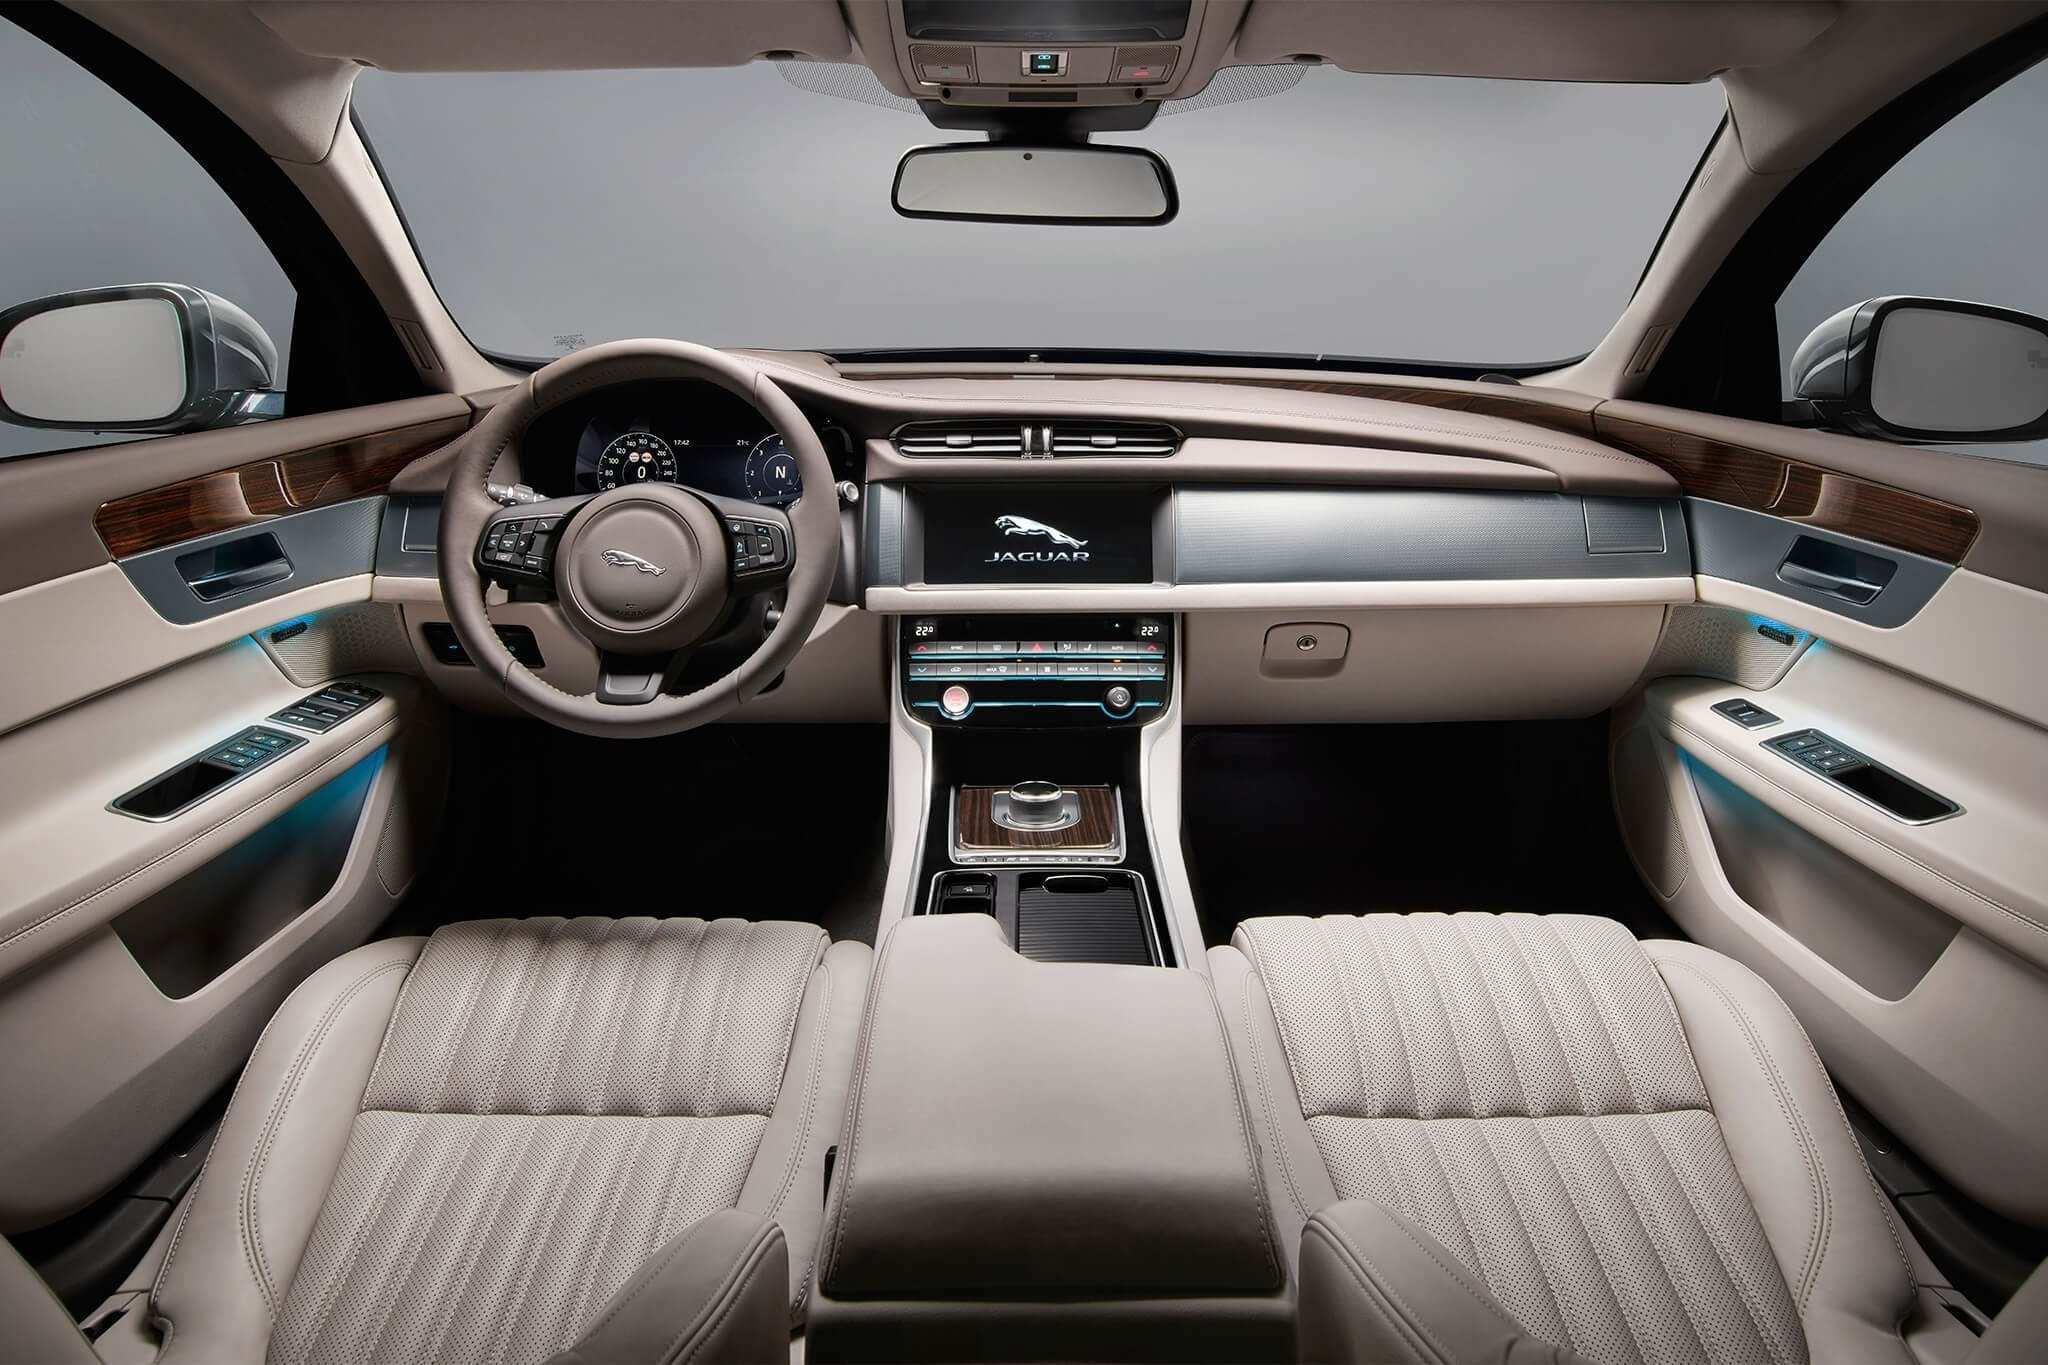 88 New 2019 Jaguar Xj Spy Price and Review for 2019 Jaguar Xj Spy